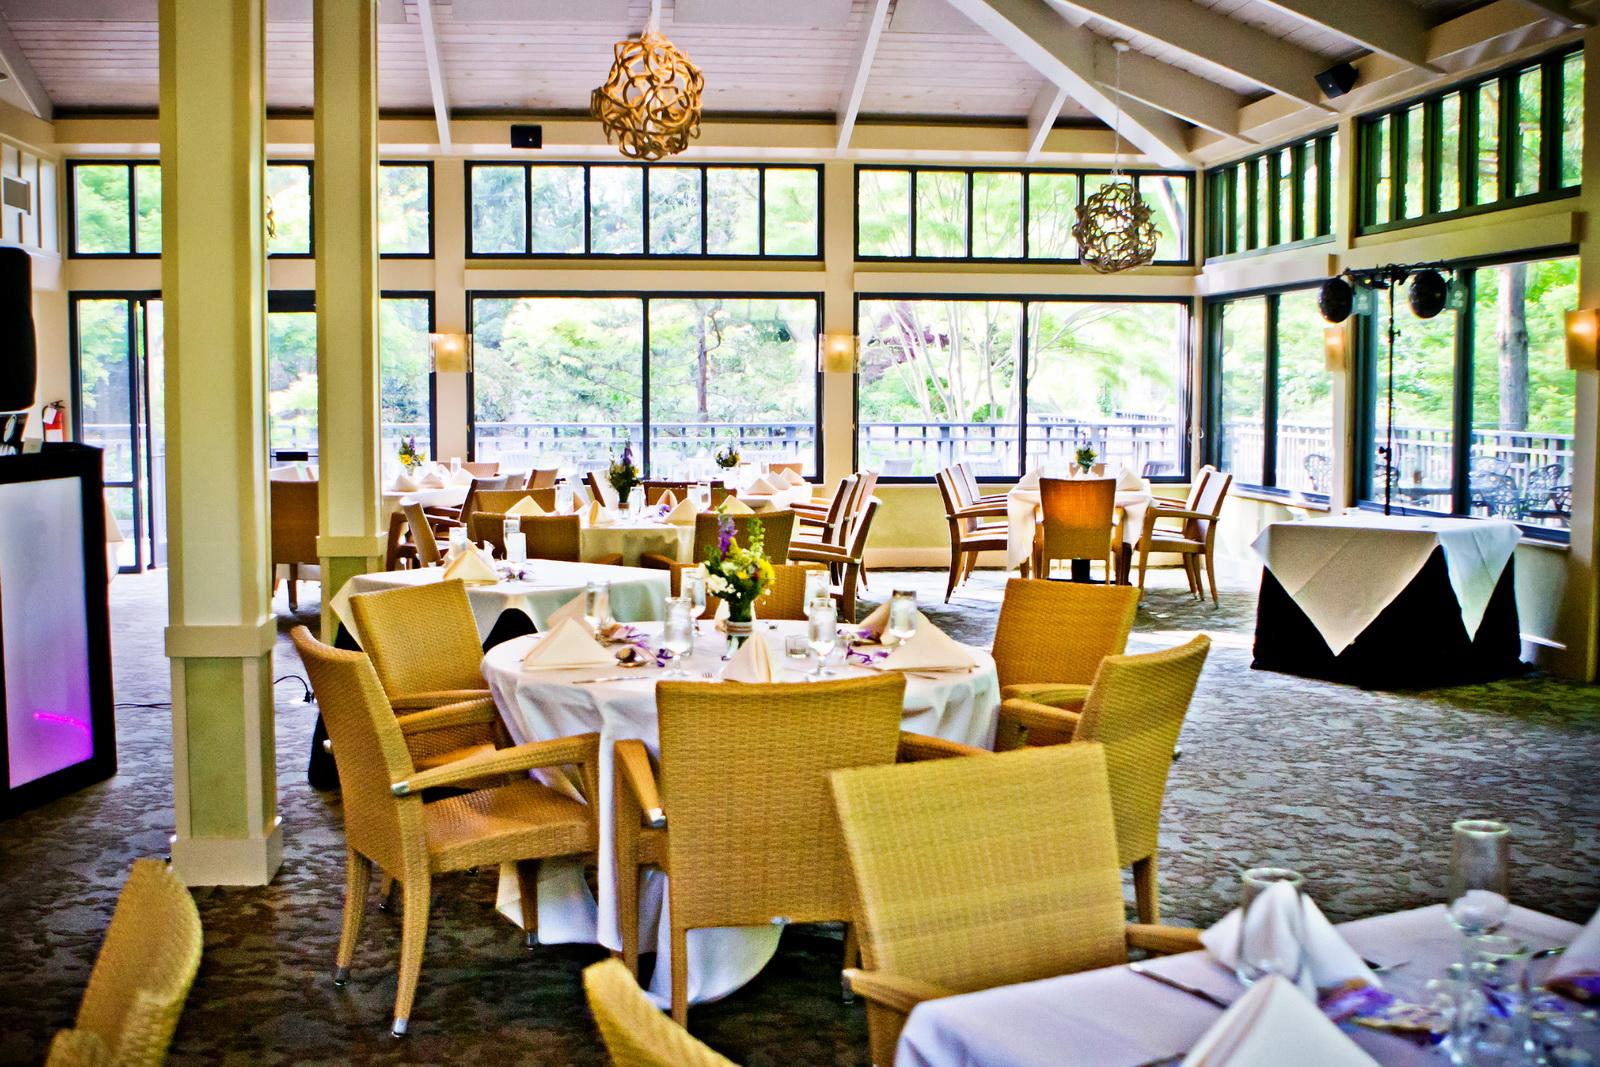 Robins Tea House Weddings Lewis Ginter Botanical Garden